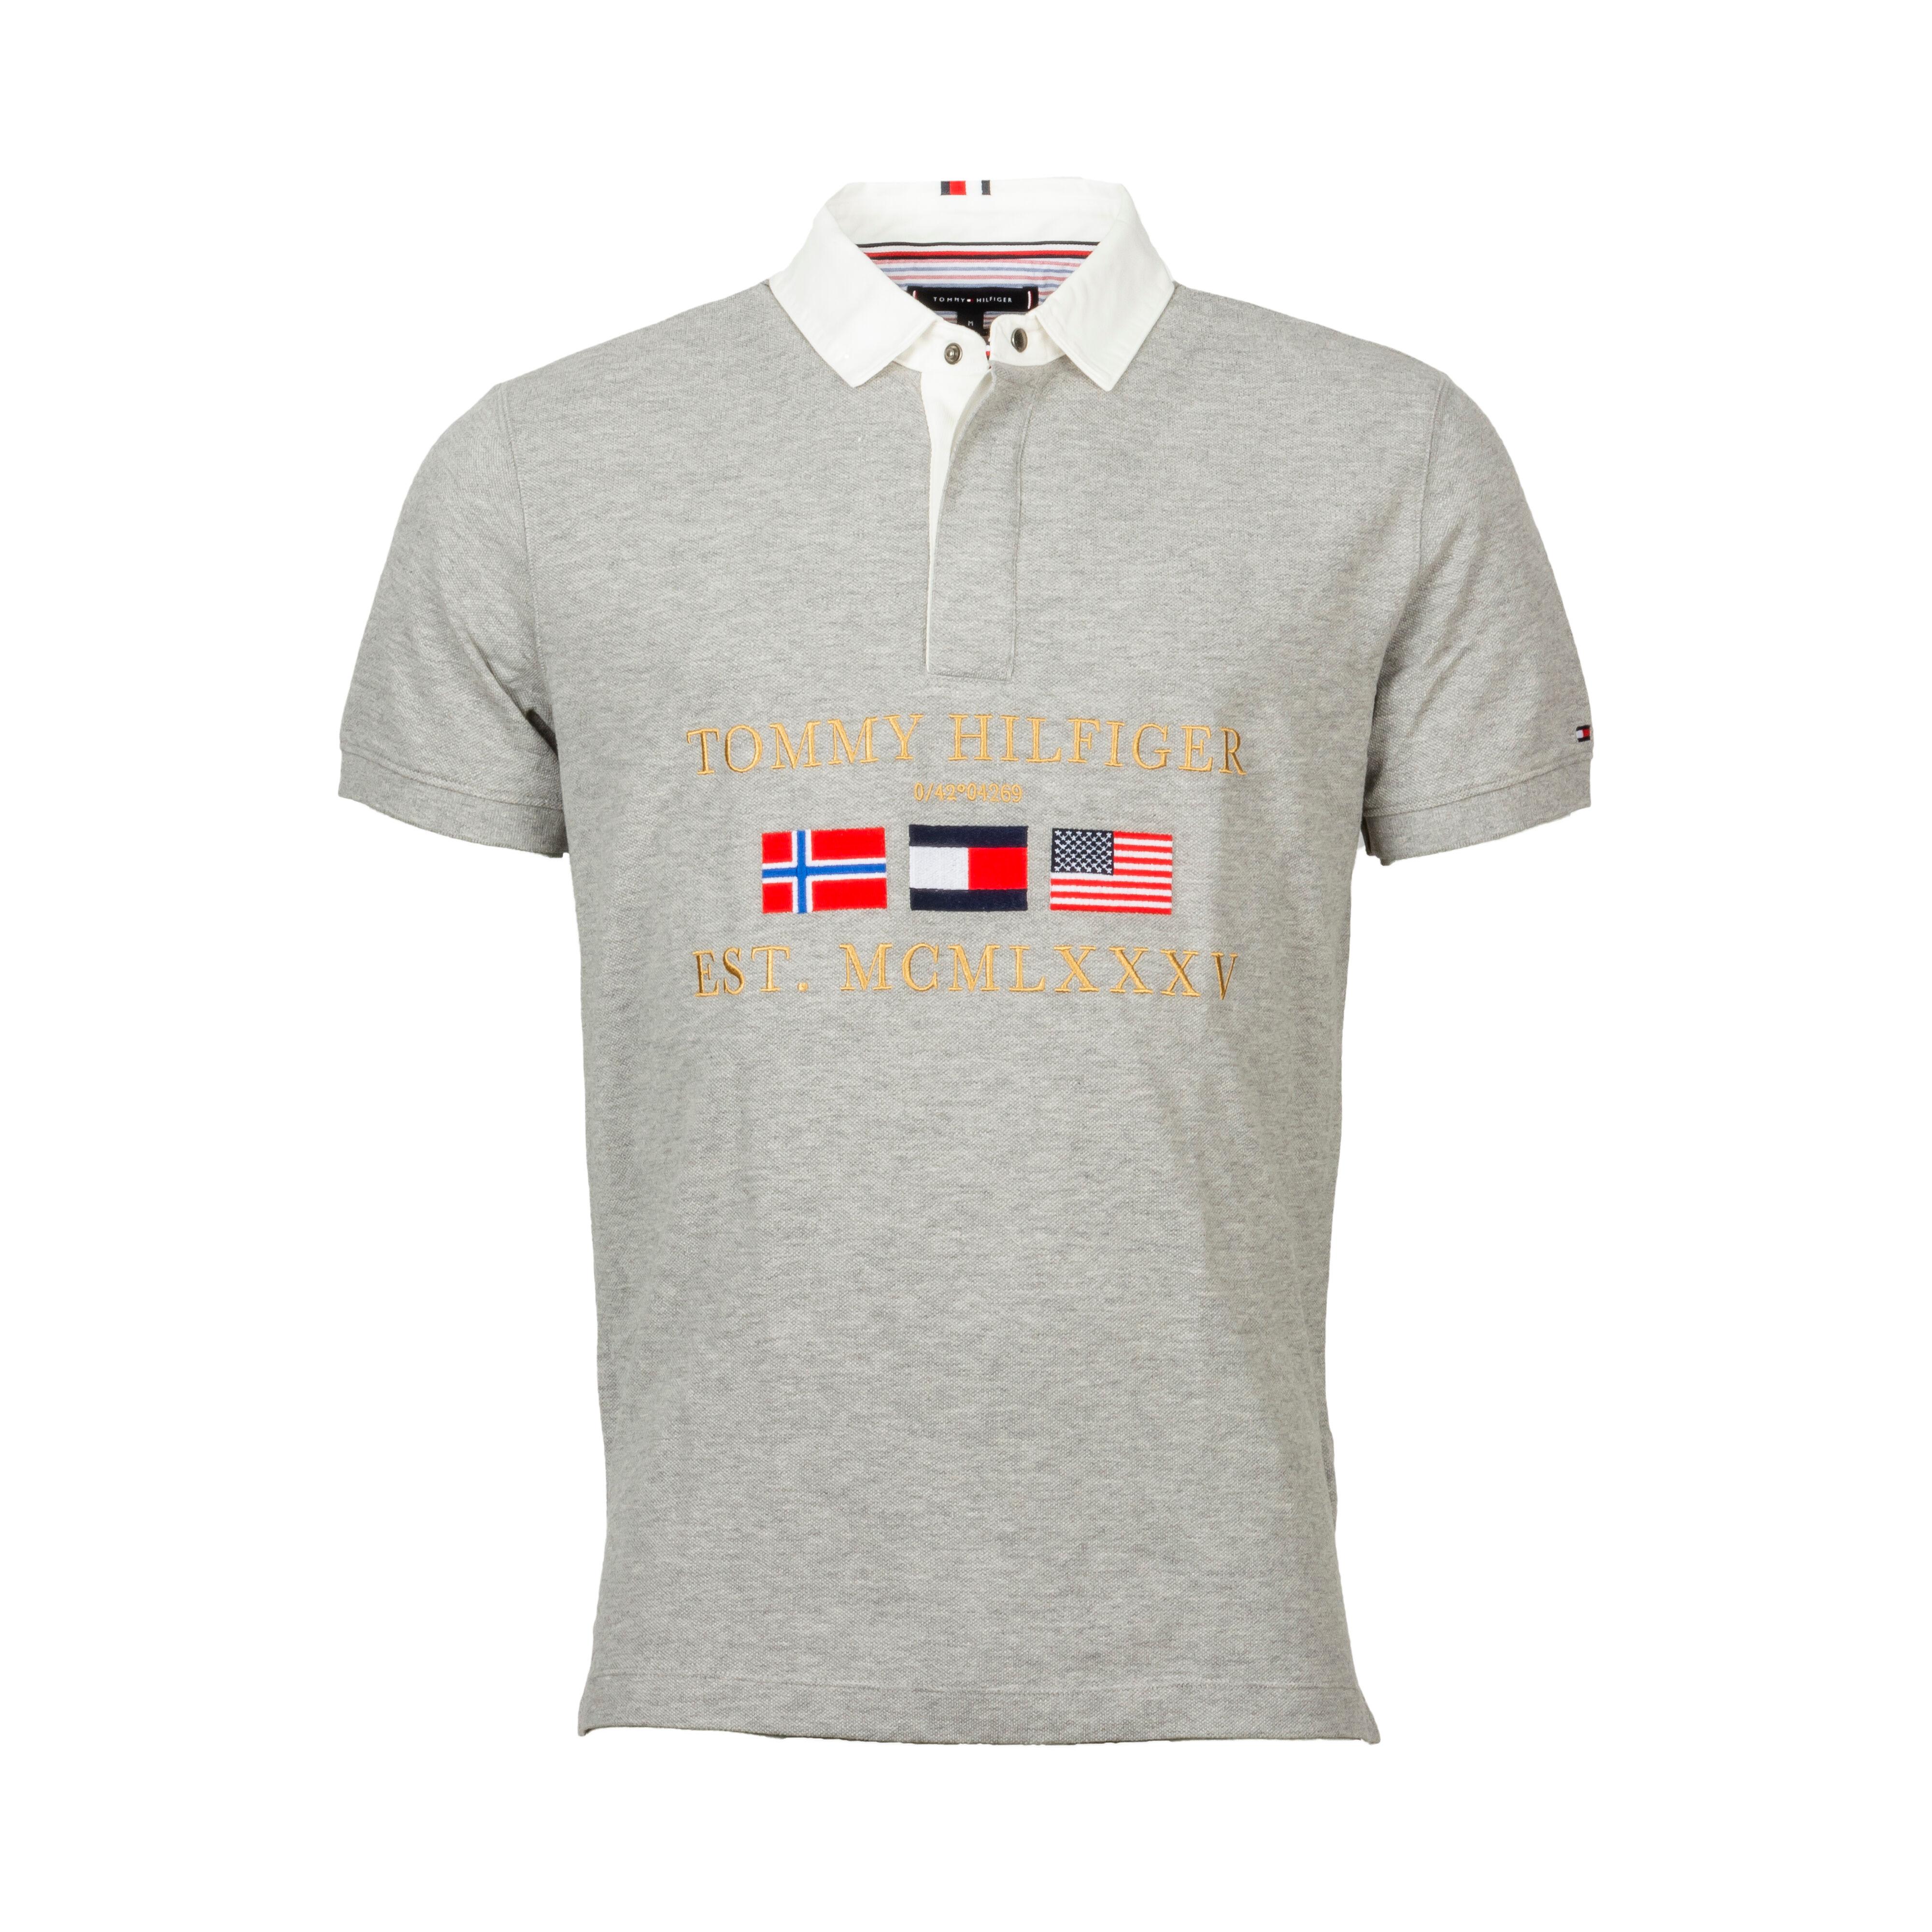 Tommy Hilfiger Polo manches courtes Tommy Hilfiger Relaxed Rugby en coton piqué gris chiné - GRIS - XL